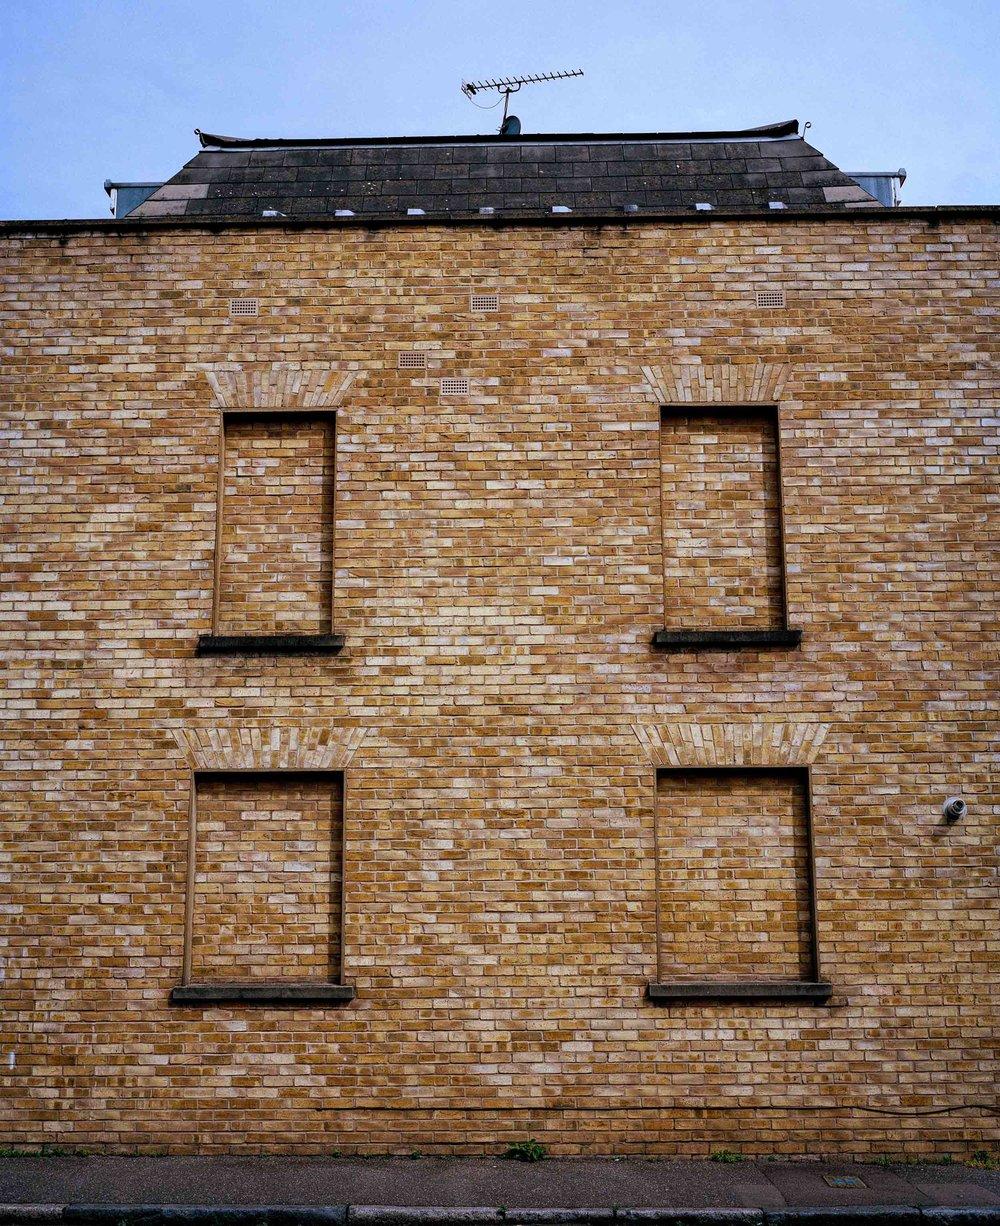 14-blighty-england-london-sam-gregg-photography.jpg